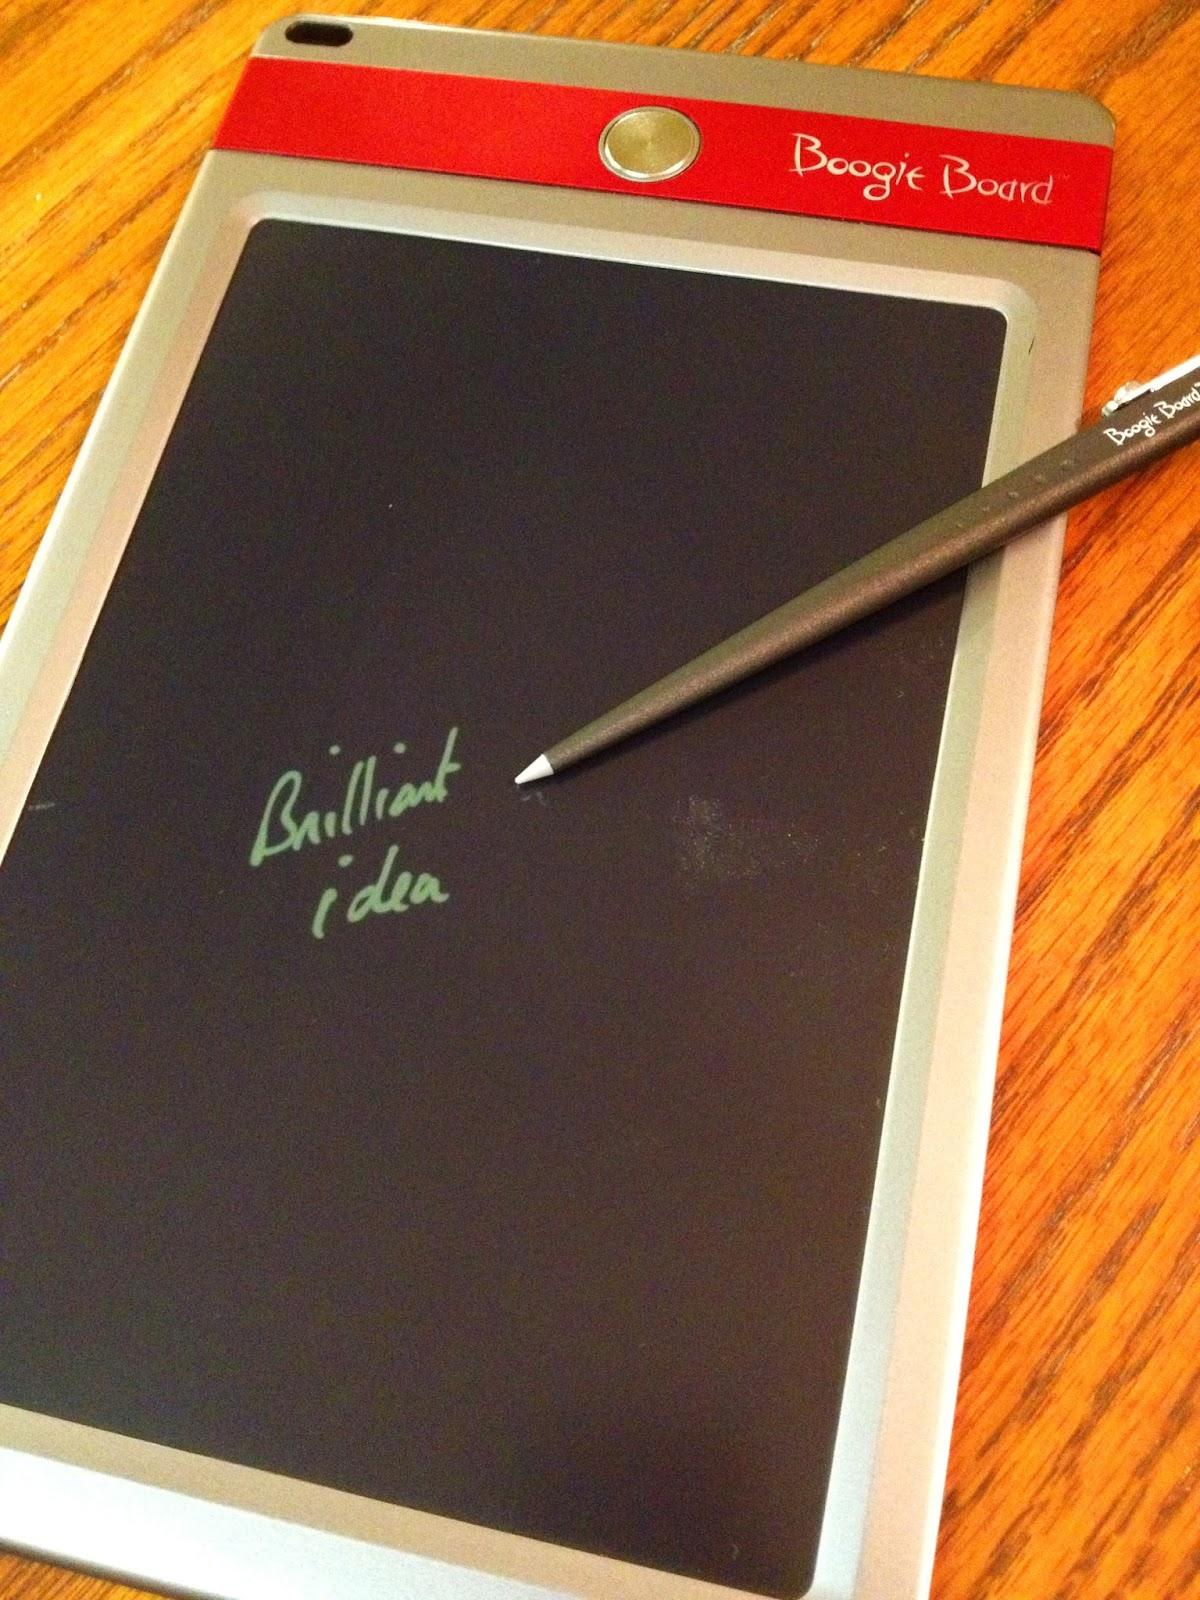 Magic essay writing jobs online uk